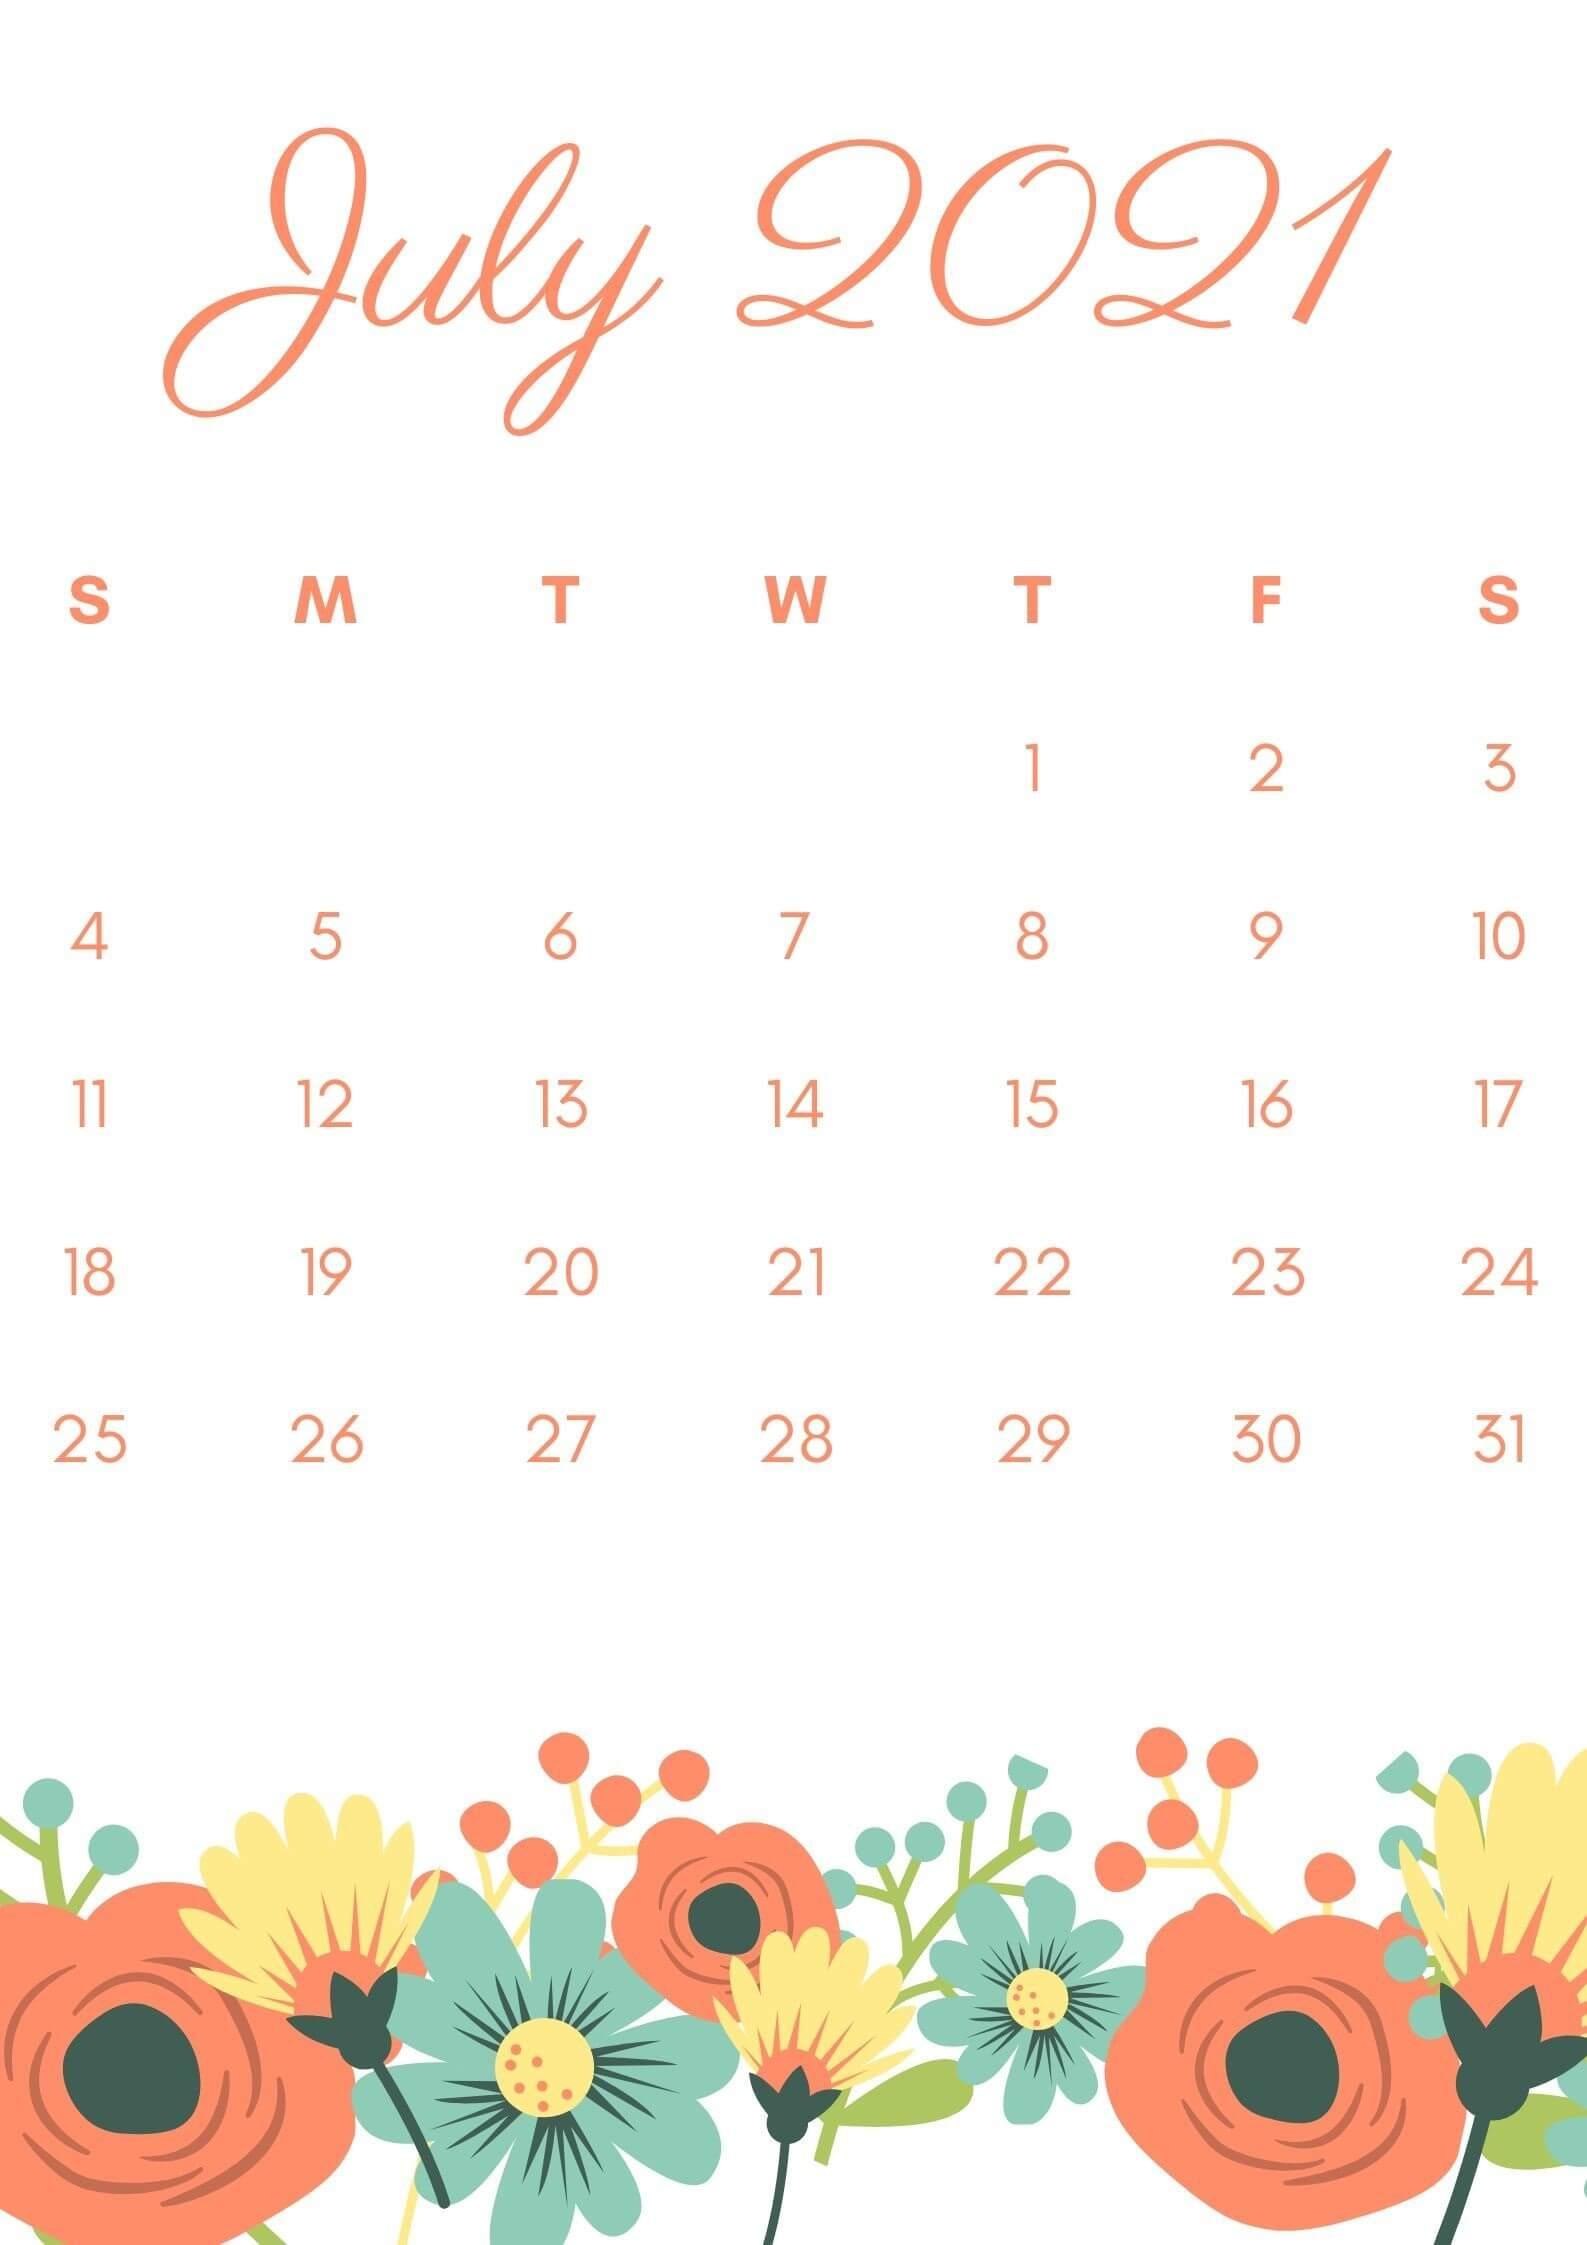 Floral July 2021 iPhone Calendar Wallpaper